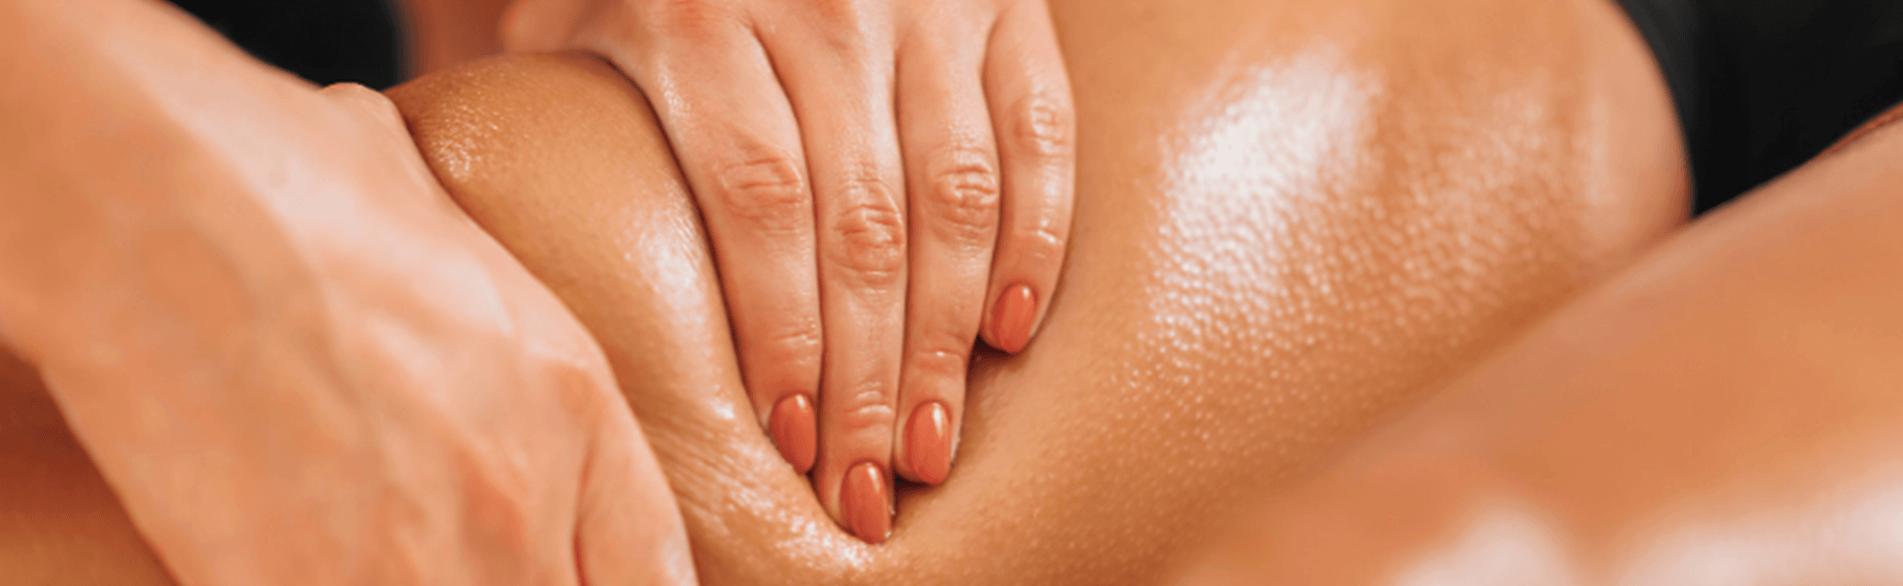 photo ostéo massage OSNA copie